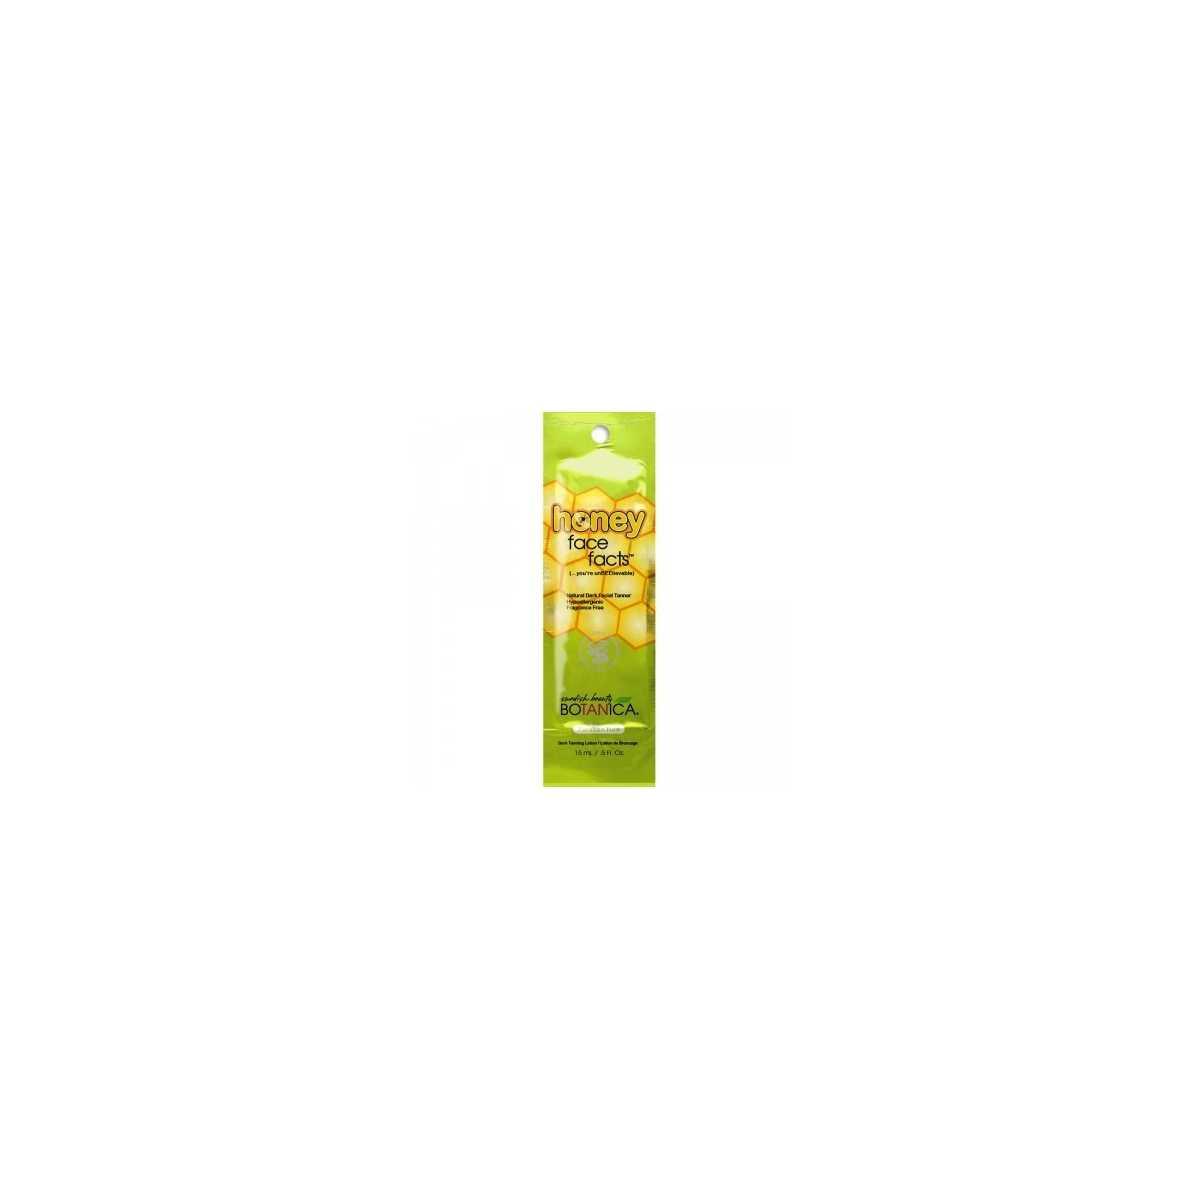 BOTANICA Honey Face Facts 15ml